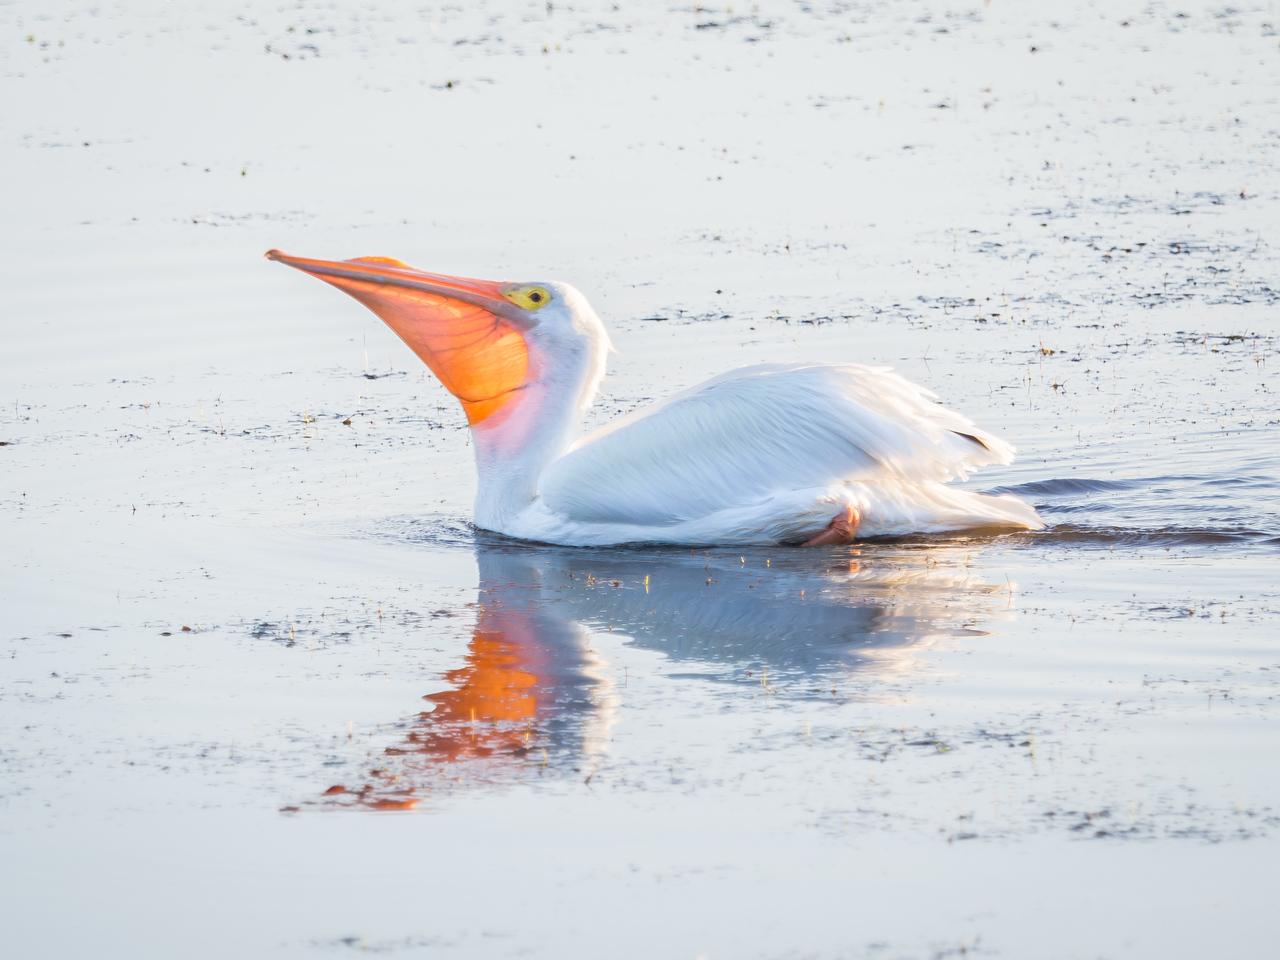 White Pelican. Ding Darling Wildlife Refuge, Sanibel Island, FL